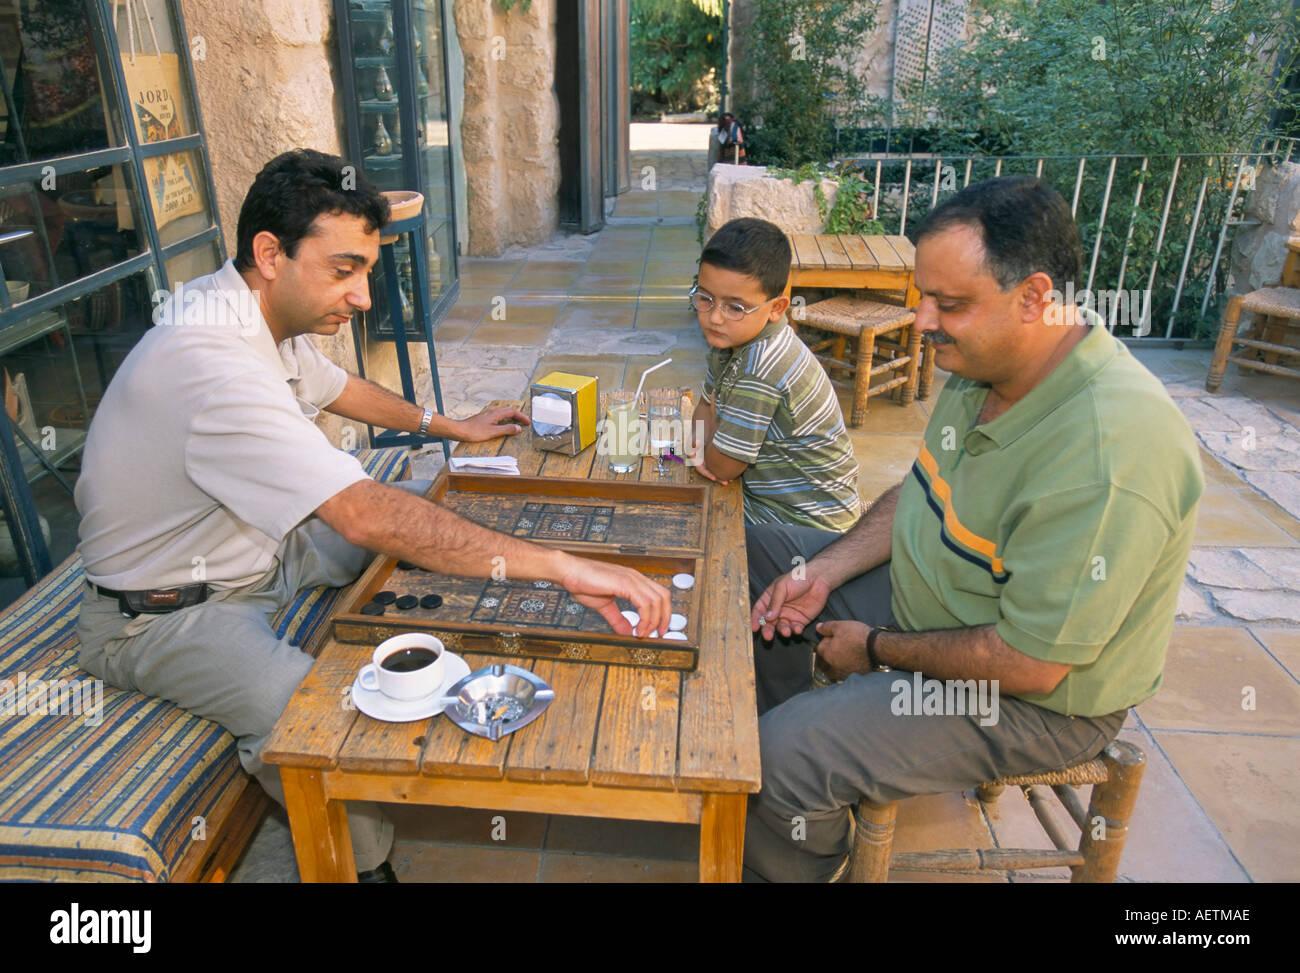 east jordan men Find dates on zoosk east jordan single men interested in dating and making new friends use zoosk date smarter date online with zoosk.